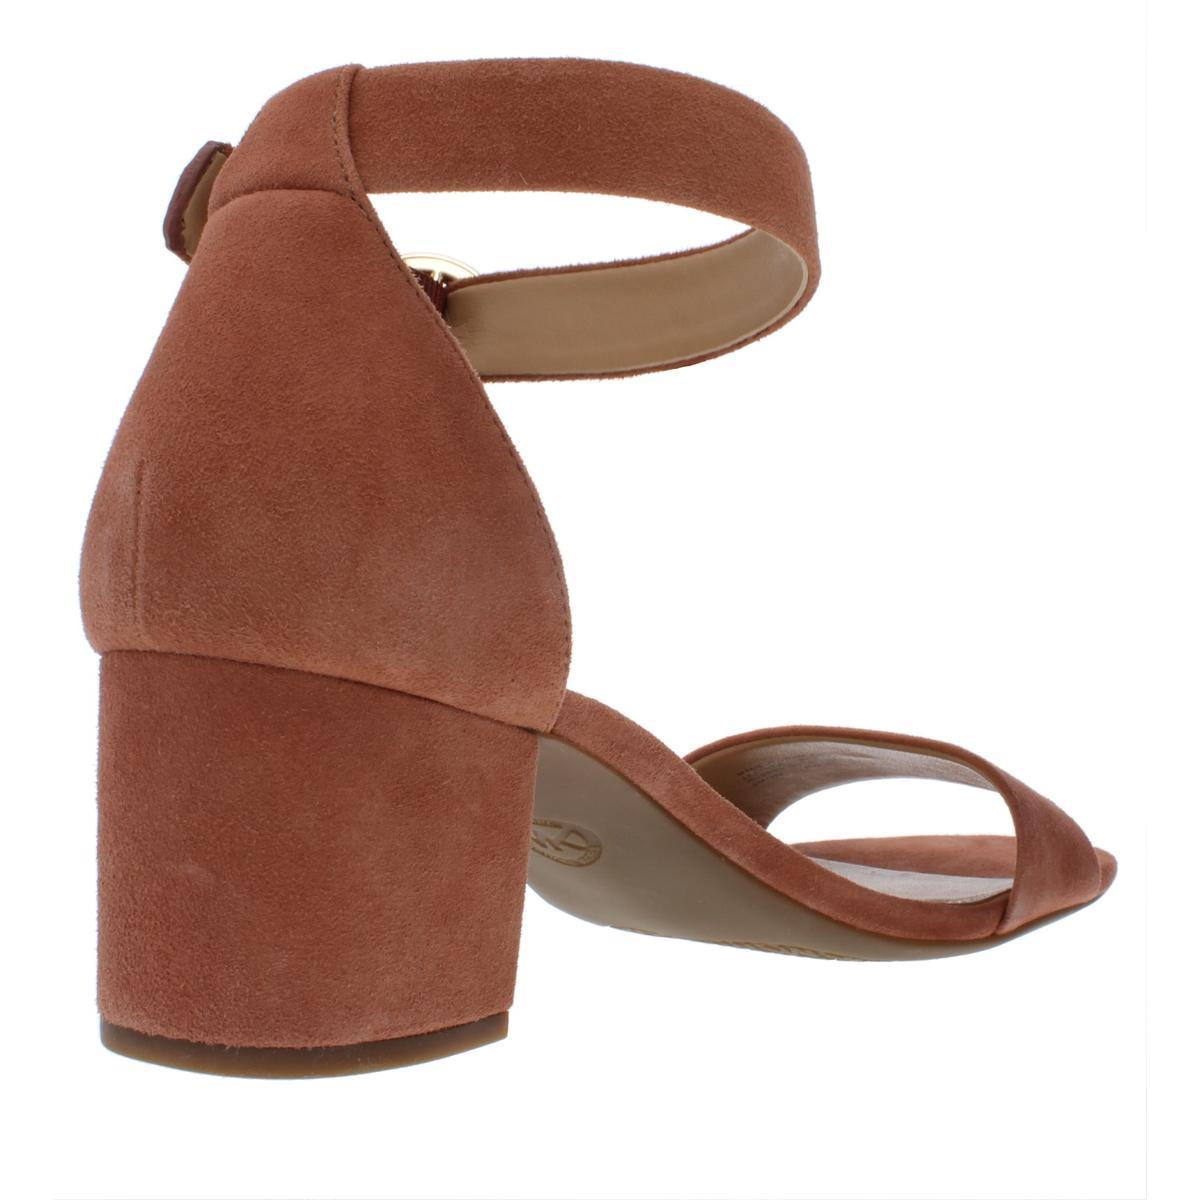 MICHAEL-Michael-Kors-Womens-Lena-Ankle-Strap-Dress-Sandals-Evening-BHFO-6788 thumbnail 7